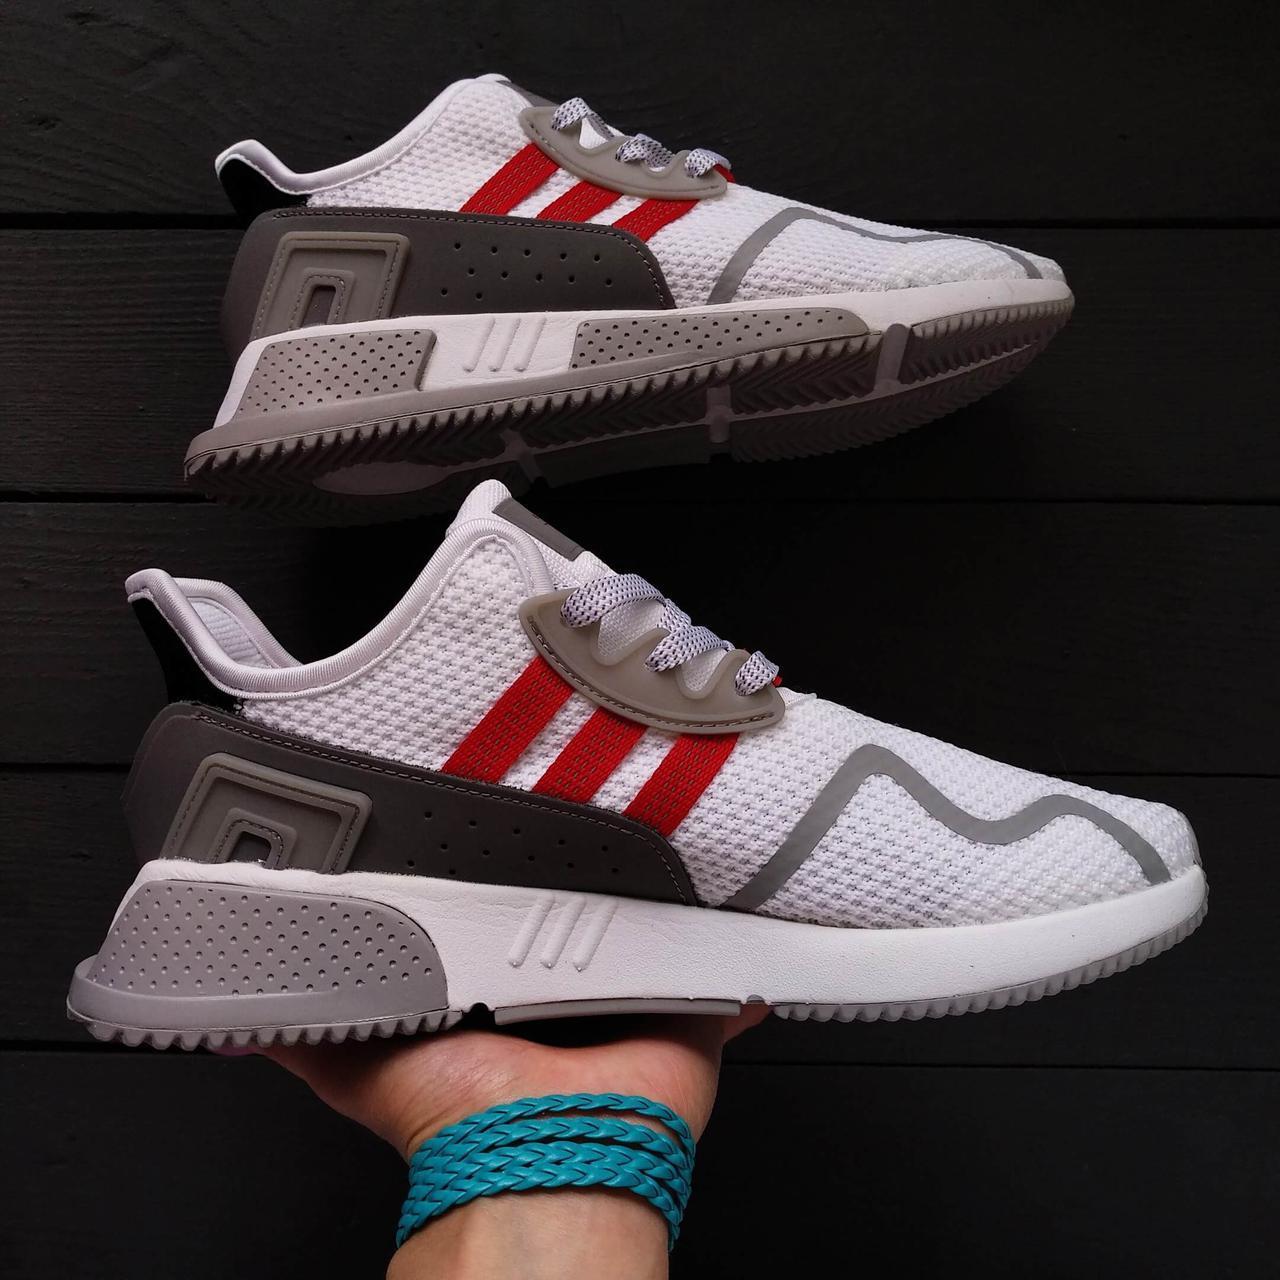 Кроссовки Adidas Equipment Cushion ADV White Red